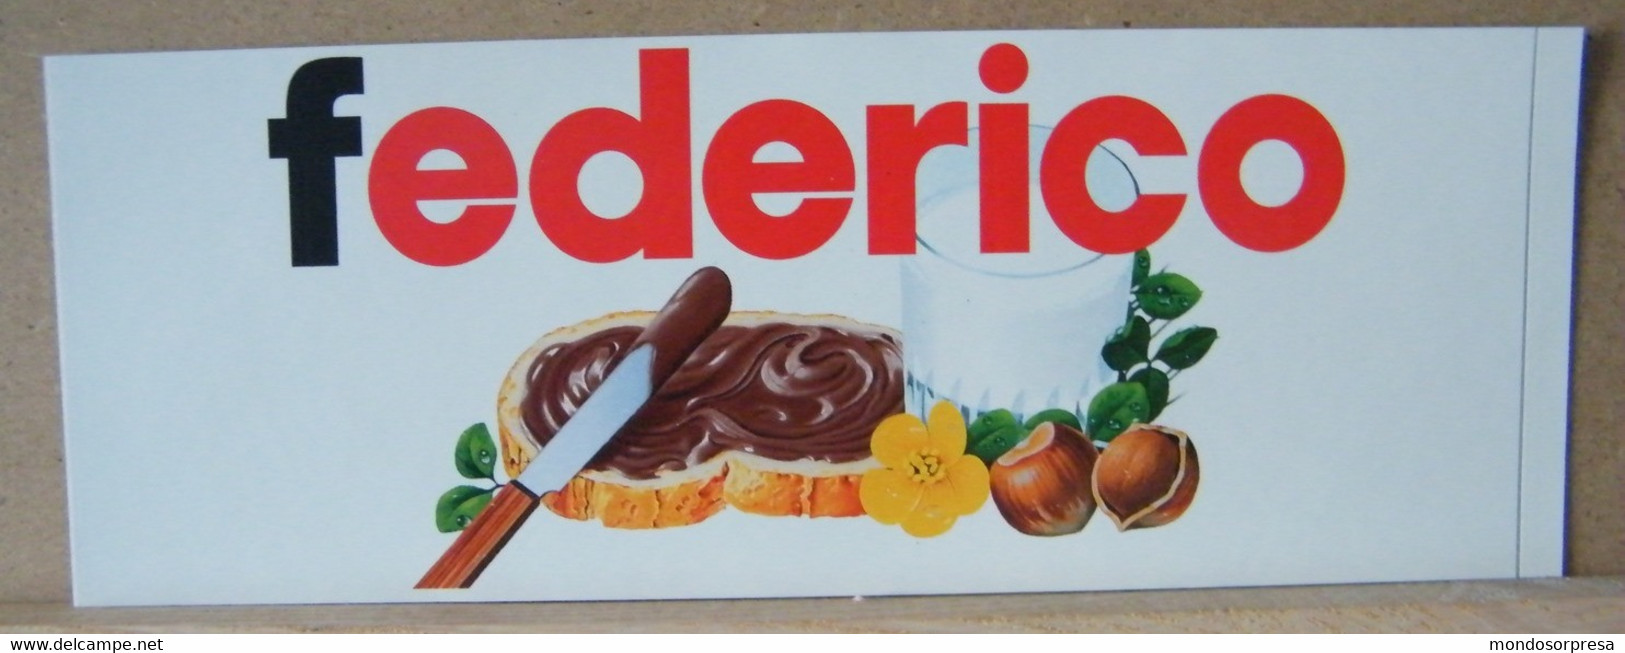 MONDOSORPRESA, ADESIVI NUTELLA NOMI, FEDERICO - Nutella